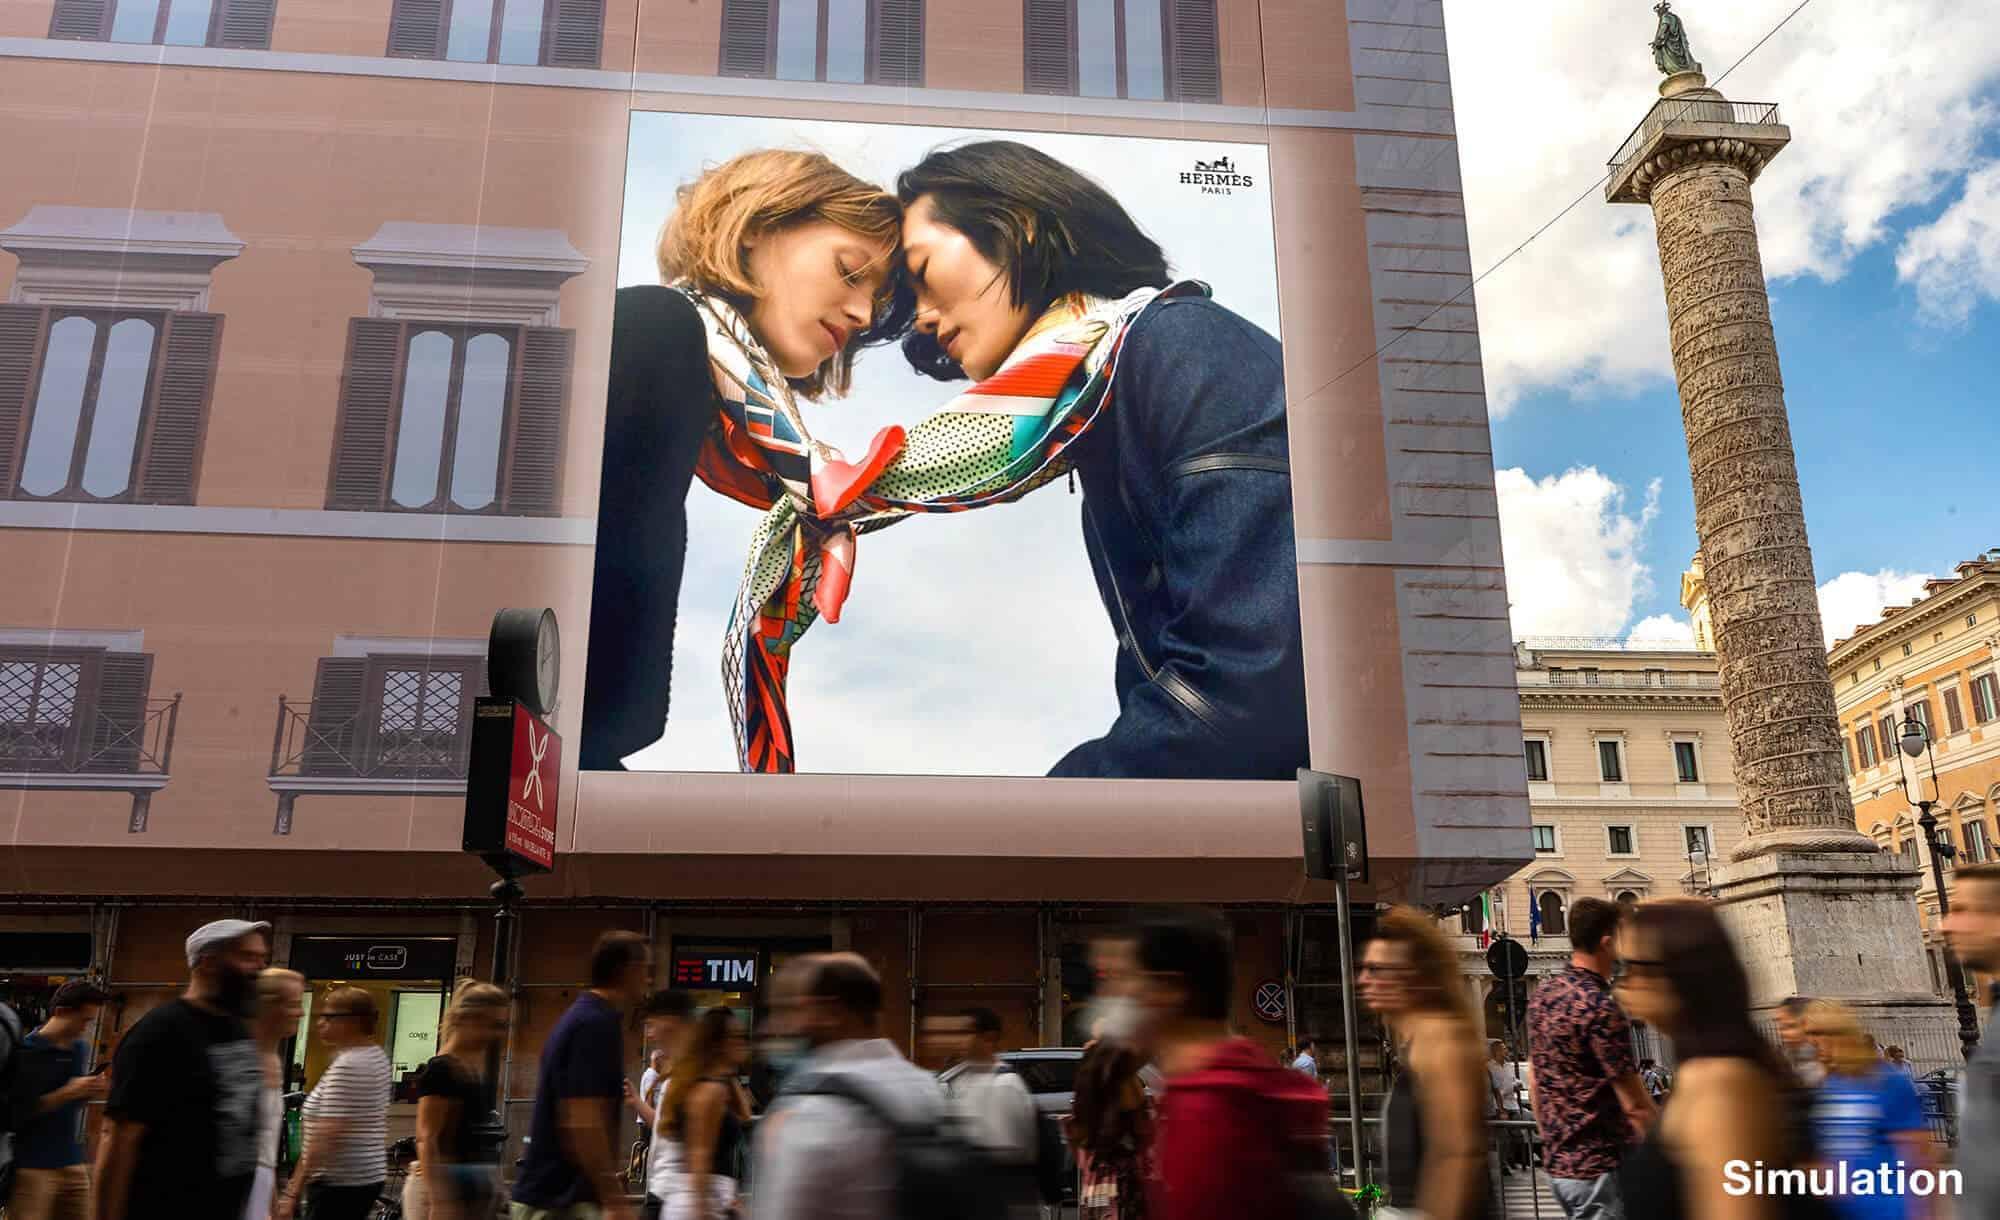 Maxi Affissione a Roma in Piazza Colonna con Hermes (Luxury)